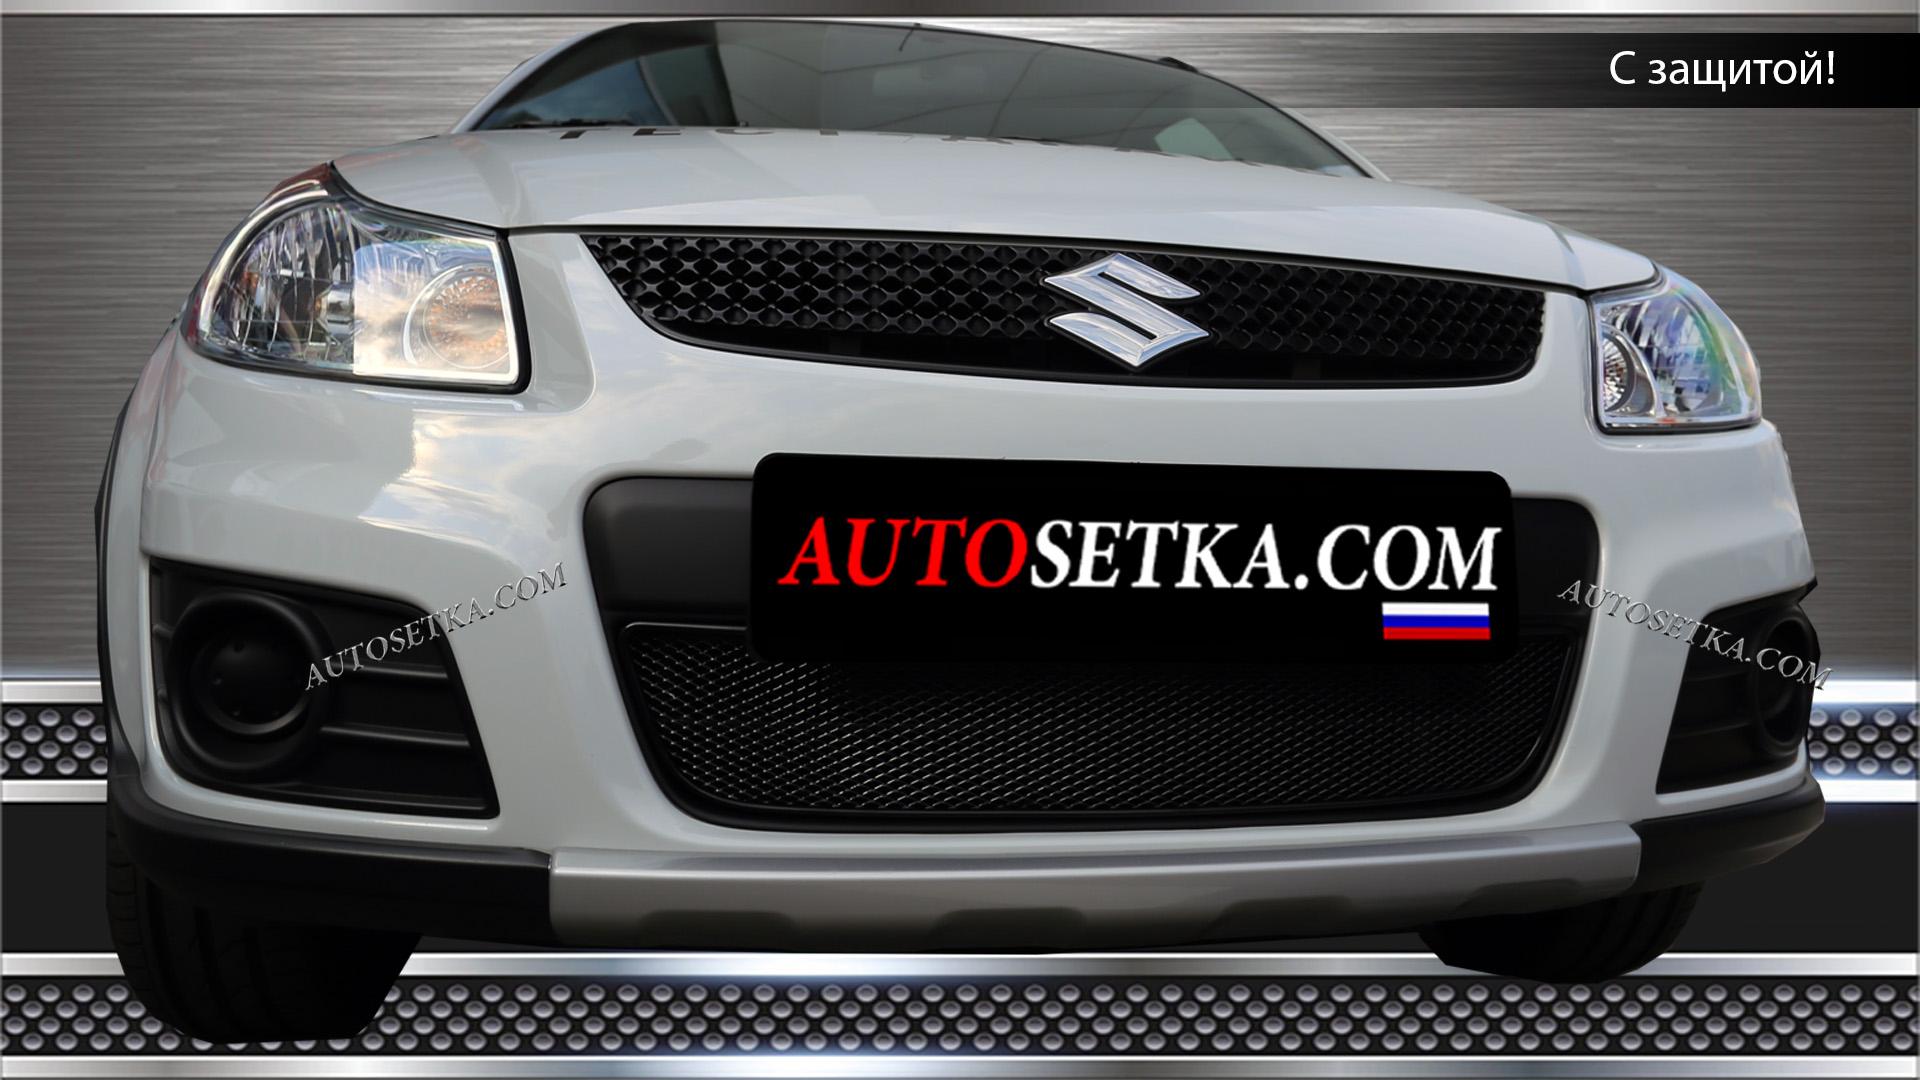 Suzuki SX4 Classic (2010-2013)